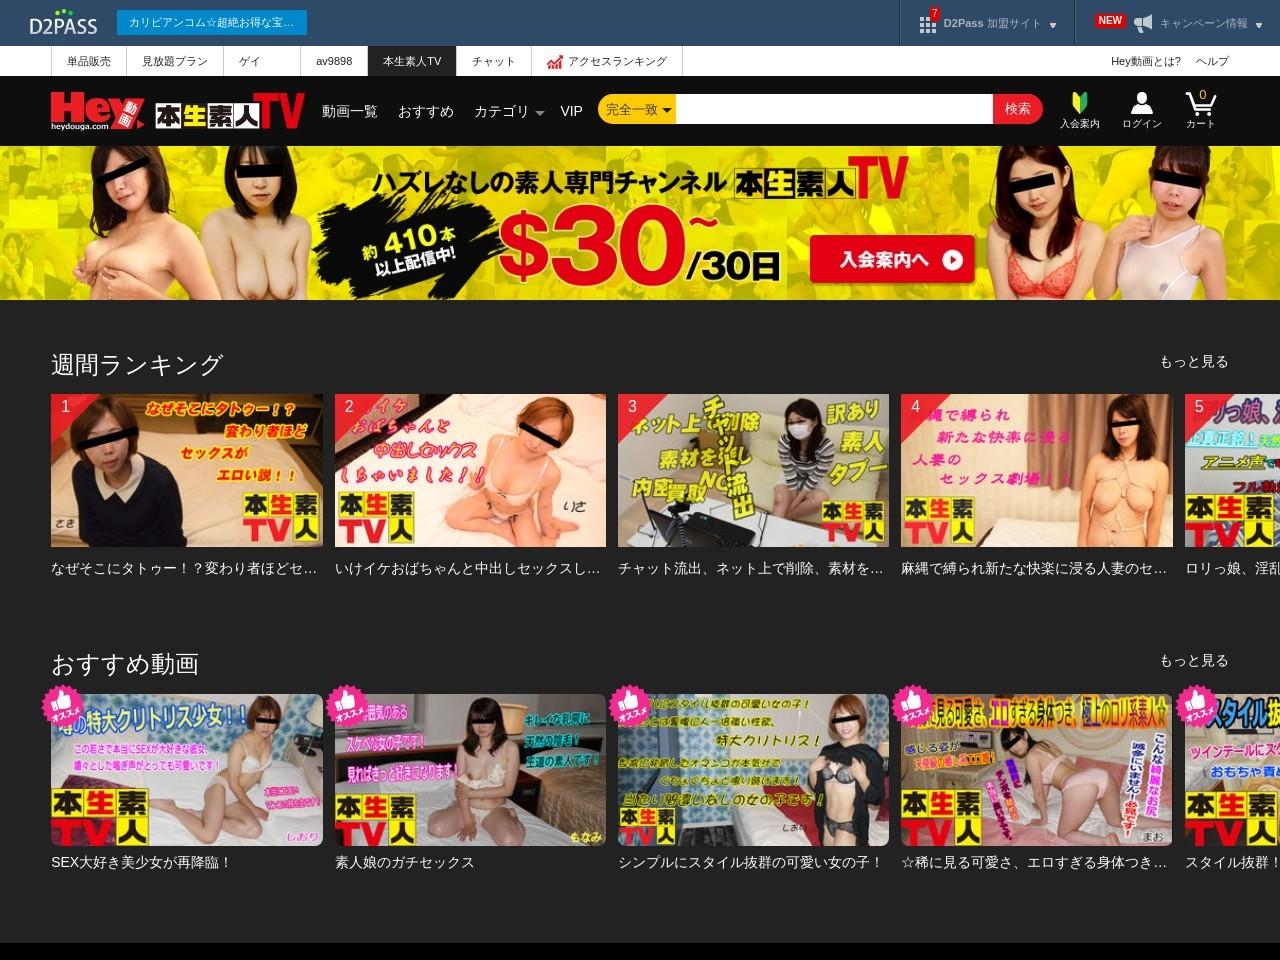 Free Cartoon Porn XXX Videos • Porn Comics • Hentai Manga